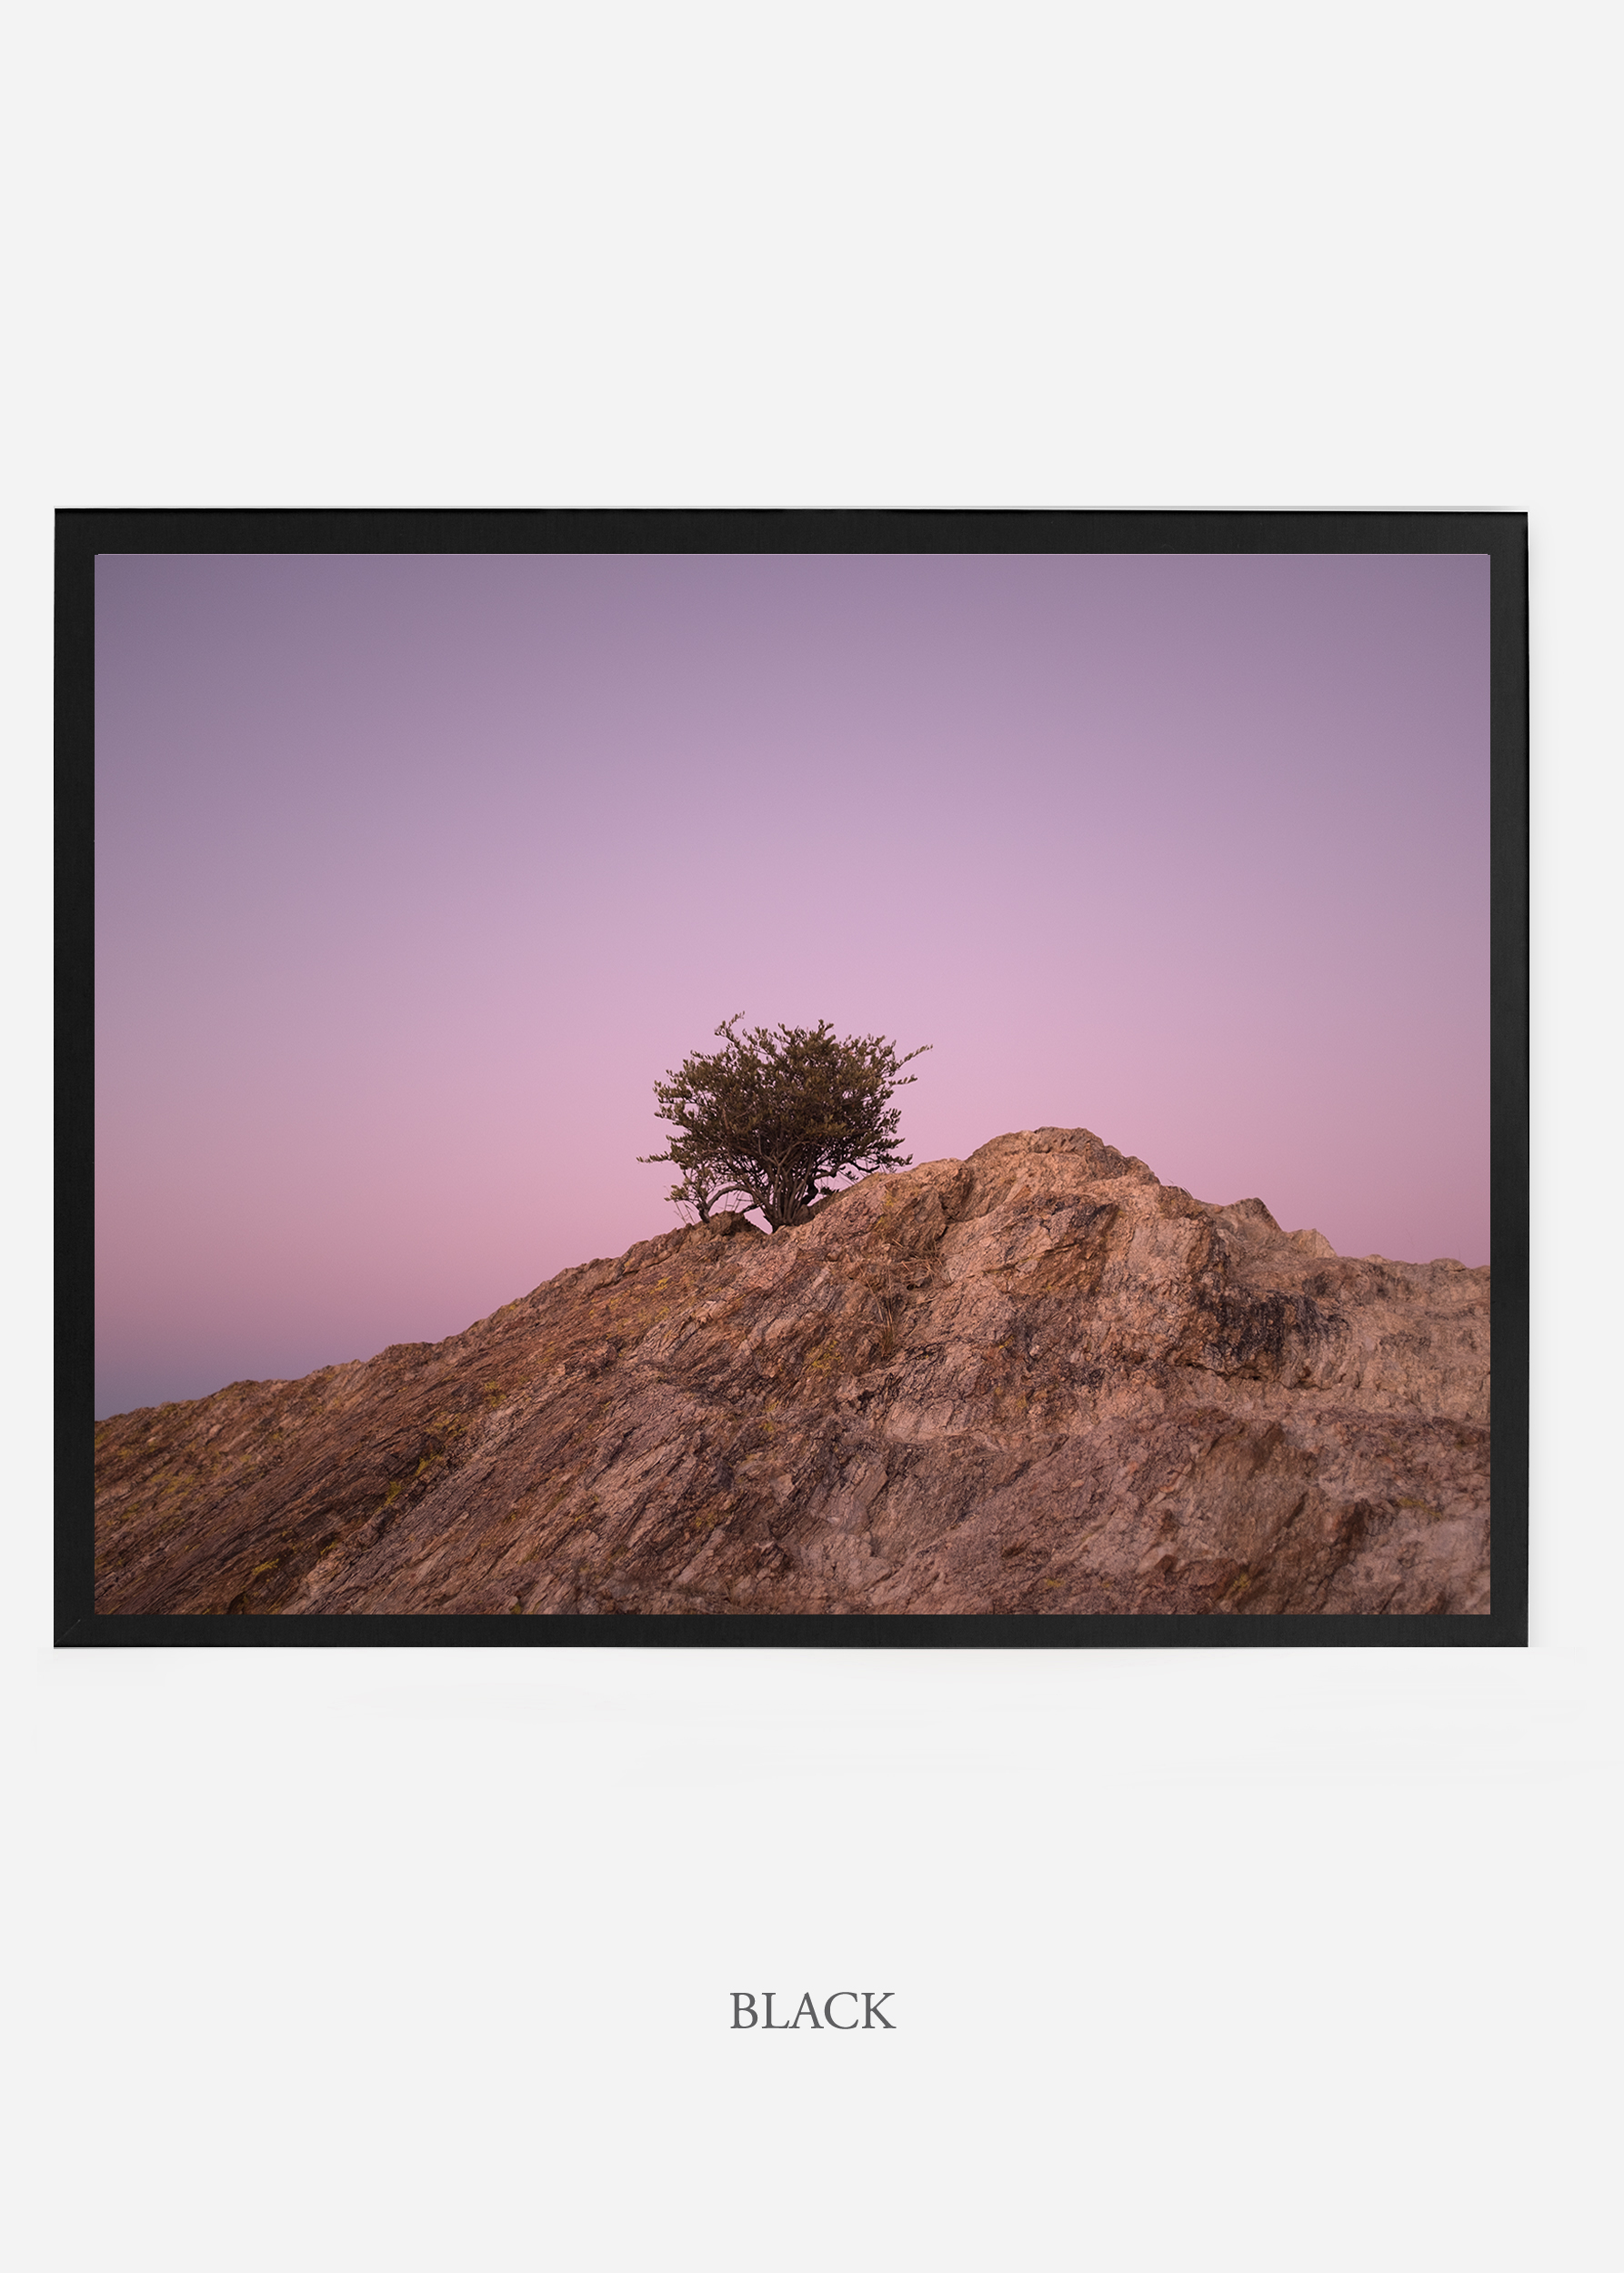 nomat_blackframe-saguaroNo.11-wildercalifornia-art-wallart-cactusprint-homedecor-prints-arizona-botanical-artwork-interiordesign.jpg